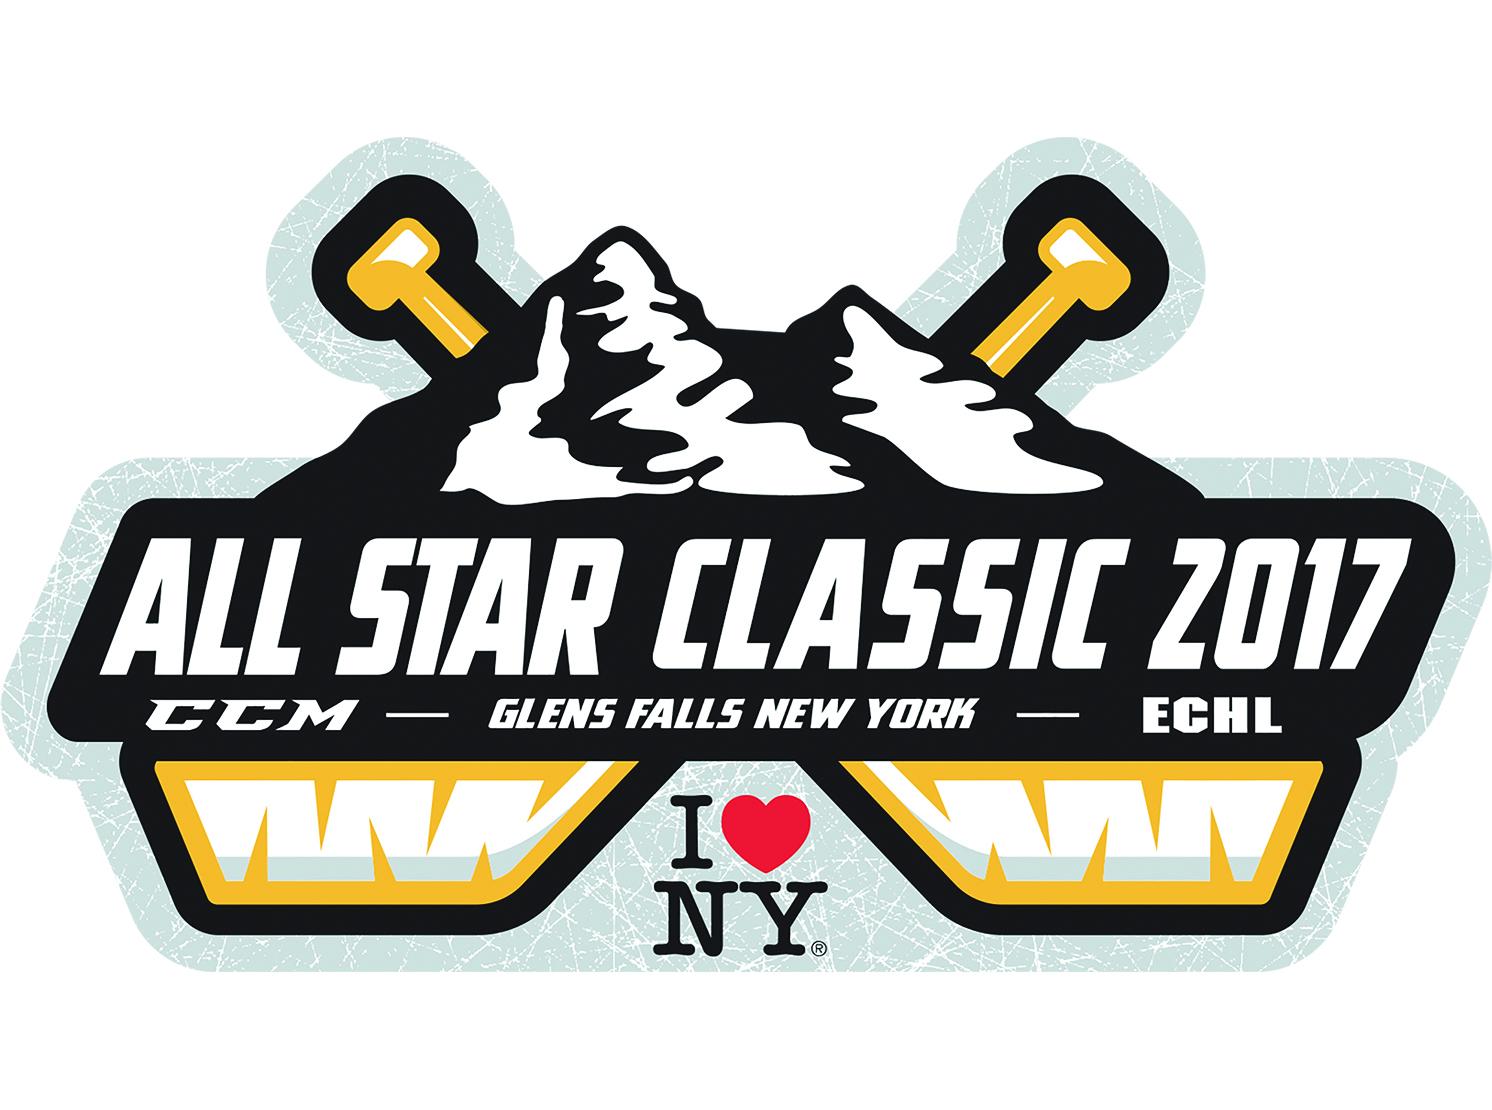 all star classic logo hc.jpg